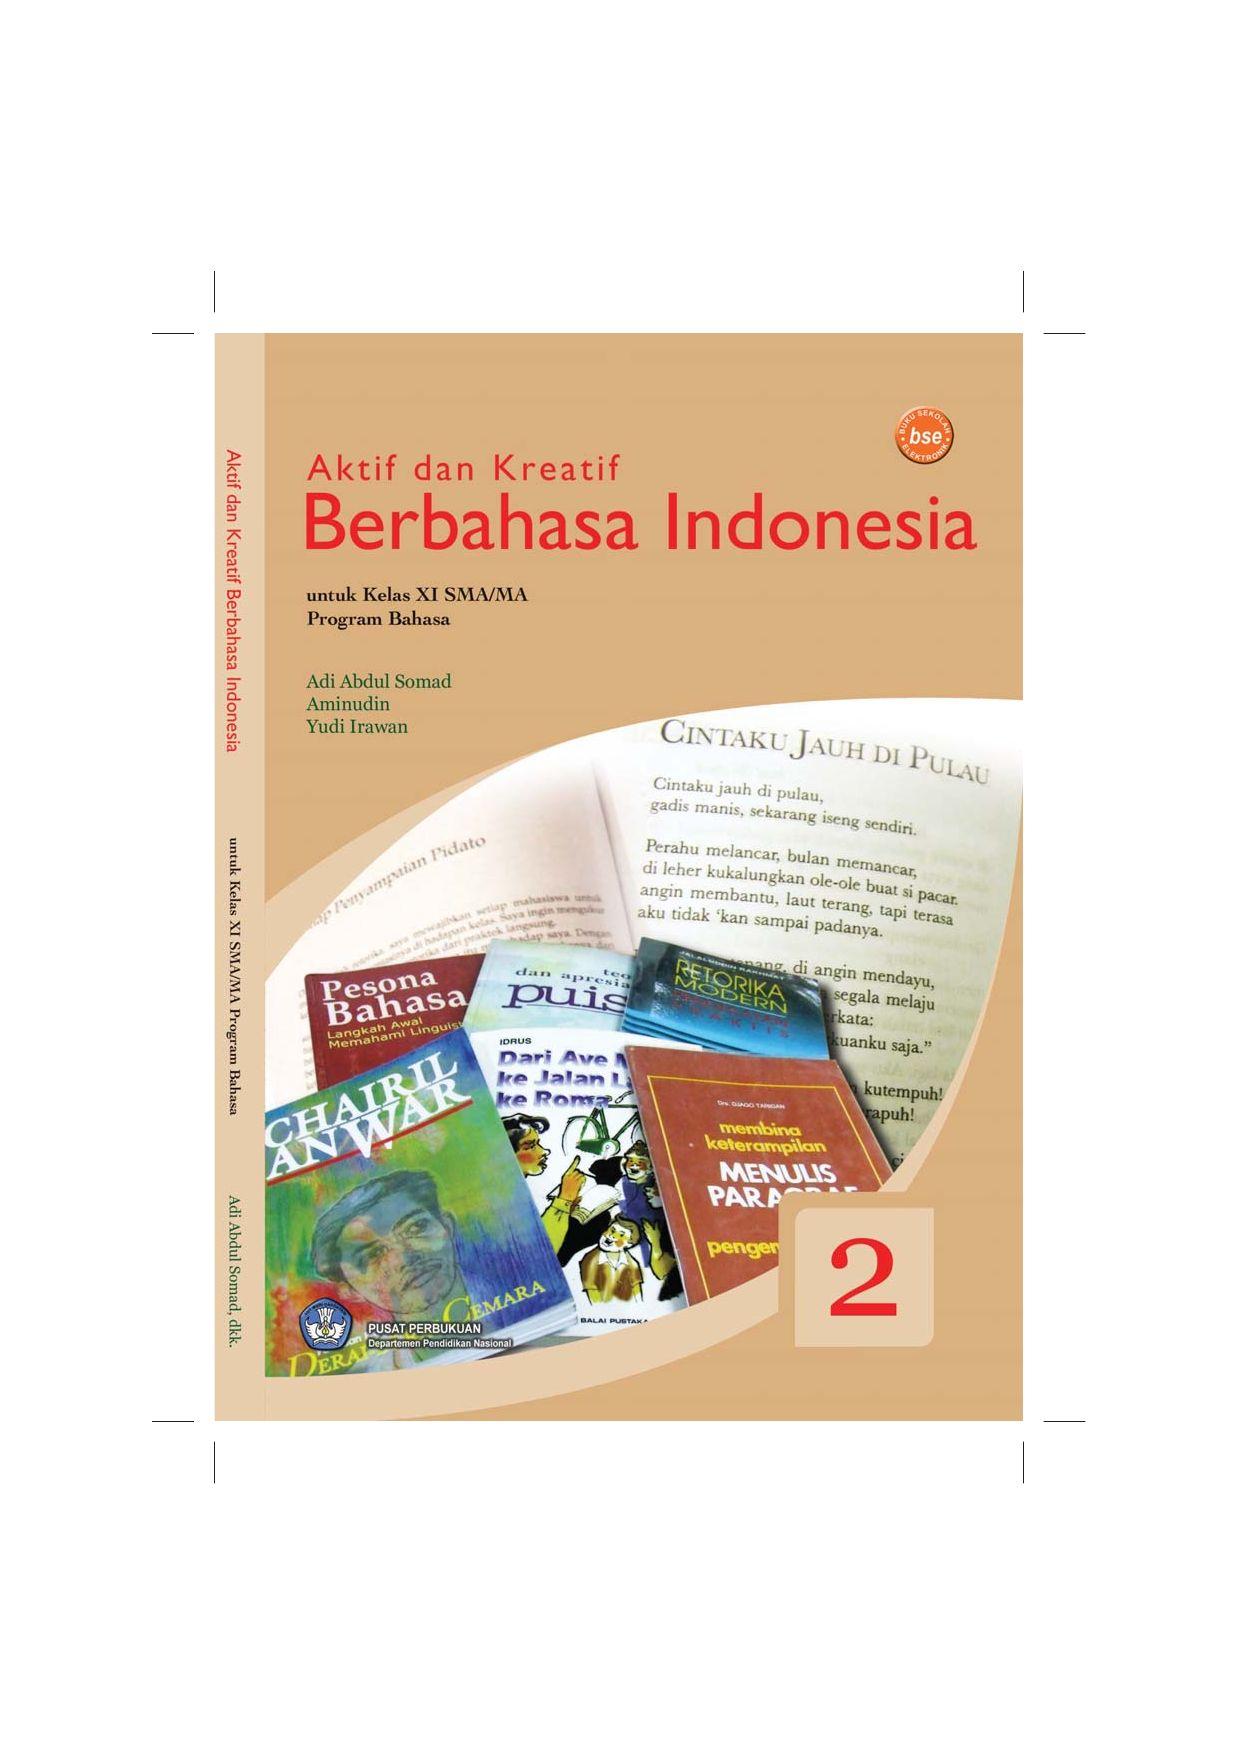 Kelas11 Program Bahasa Aktif Dan Kreatif Berbahasa Indonesia Adi By